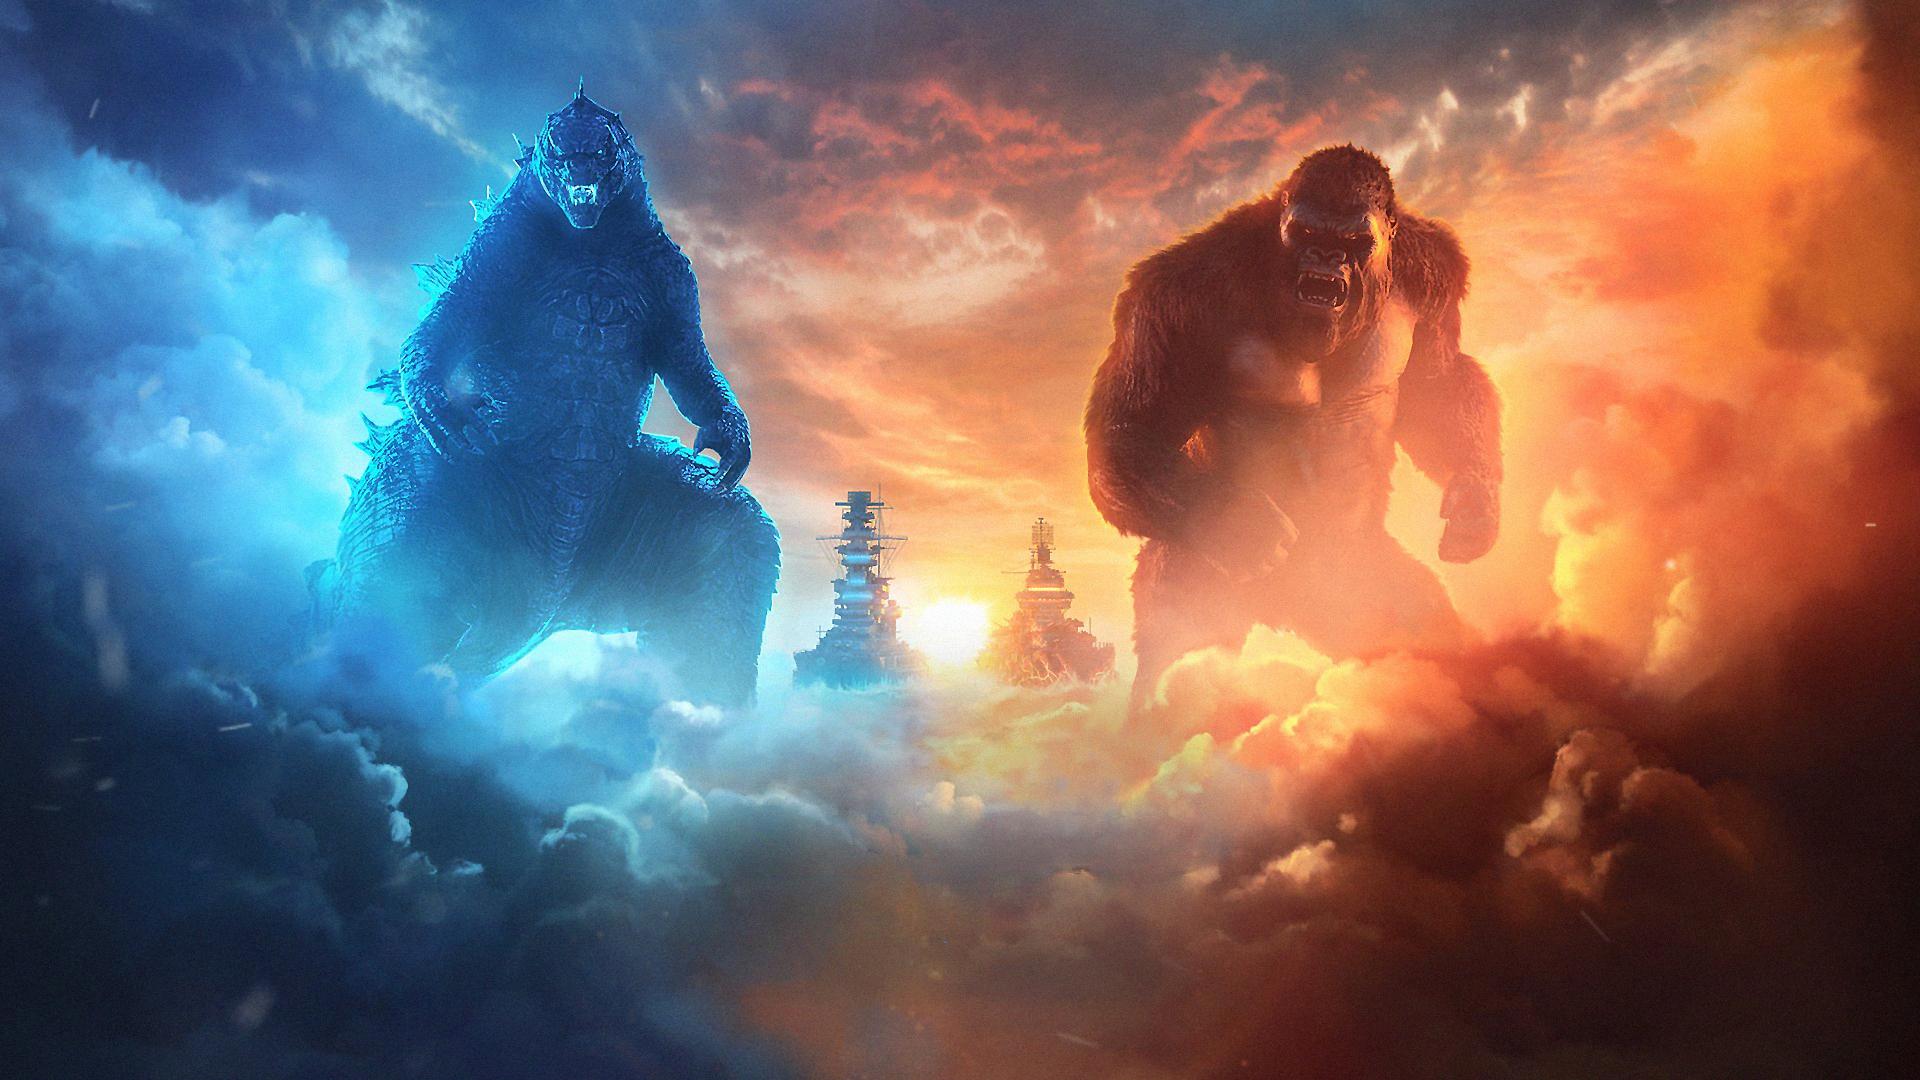 Godzilla Vs. Kong Returns To HBO Max